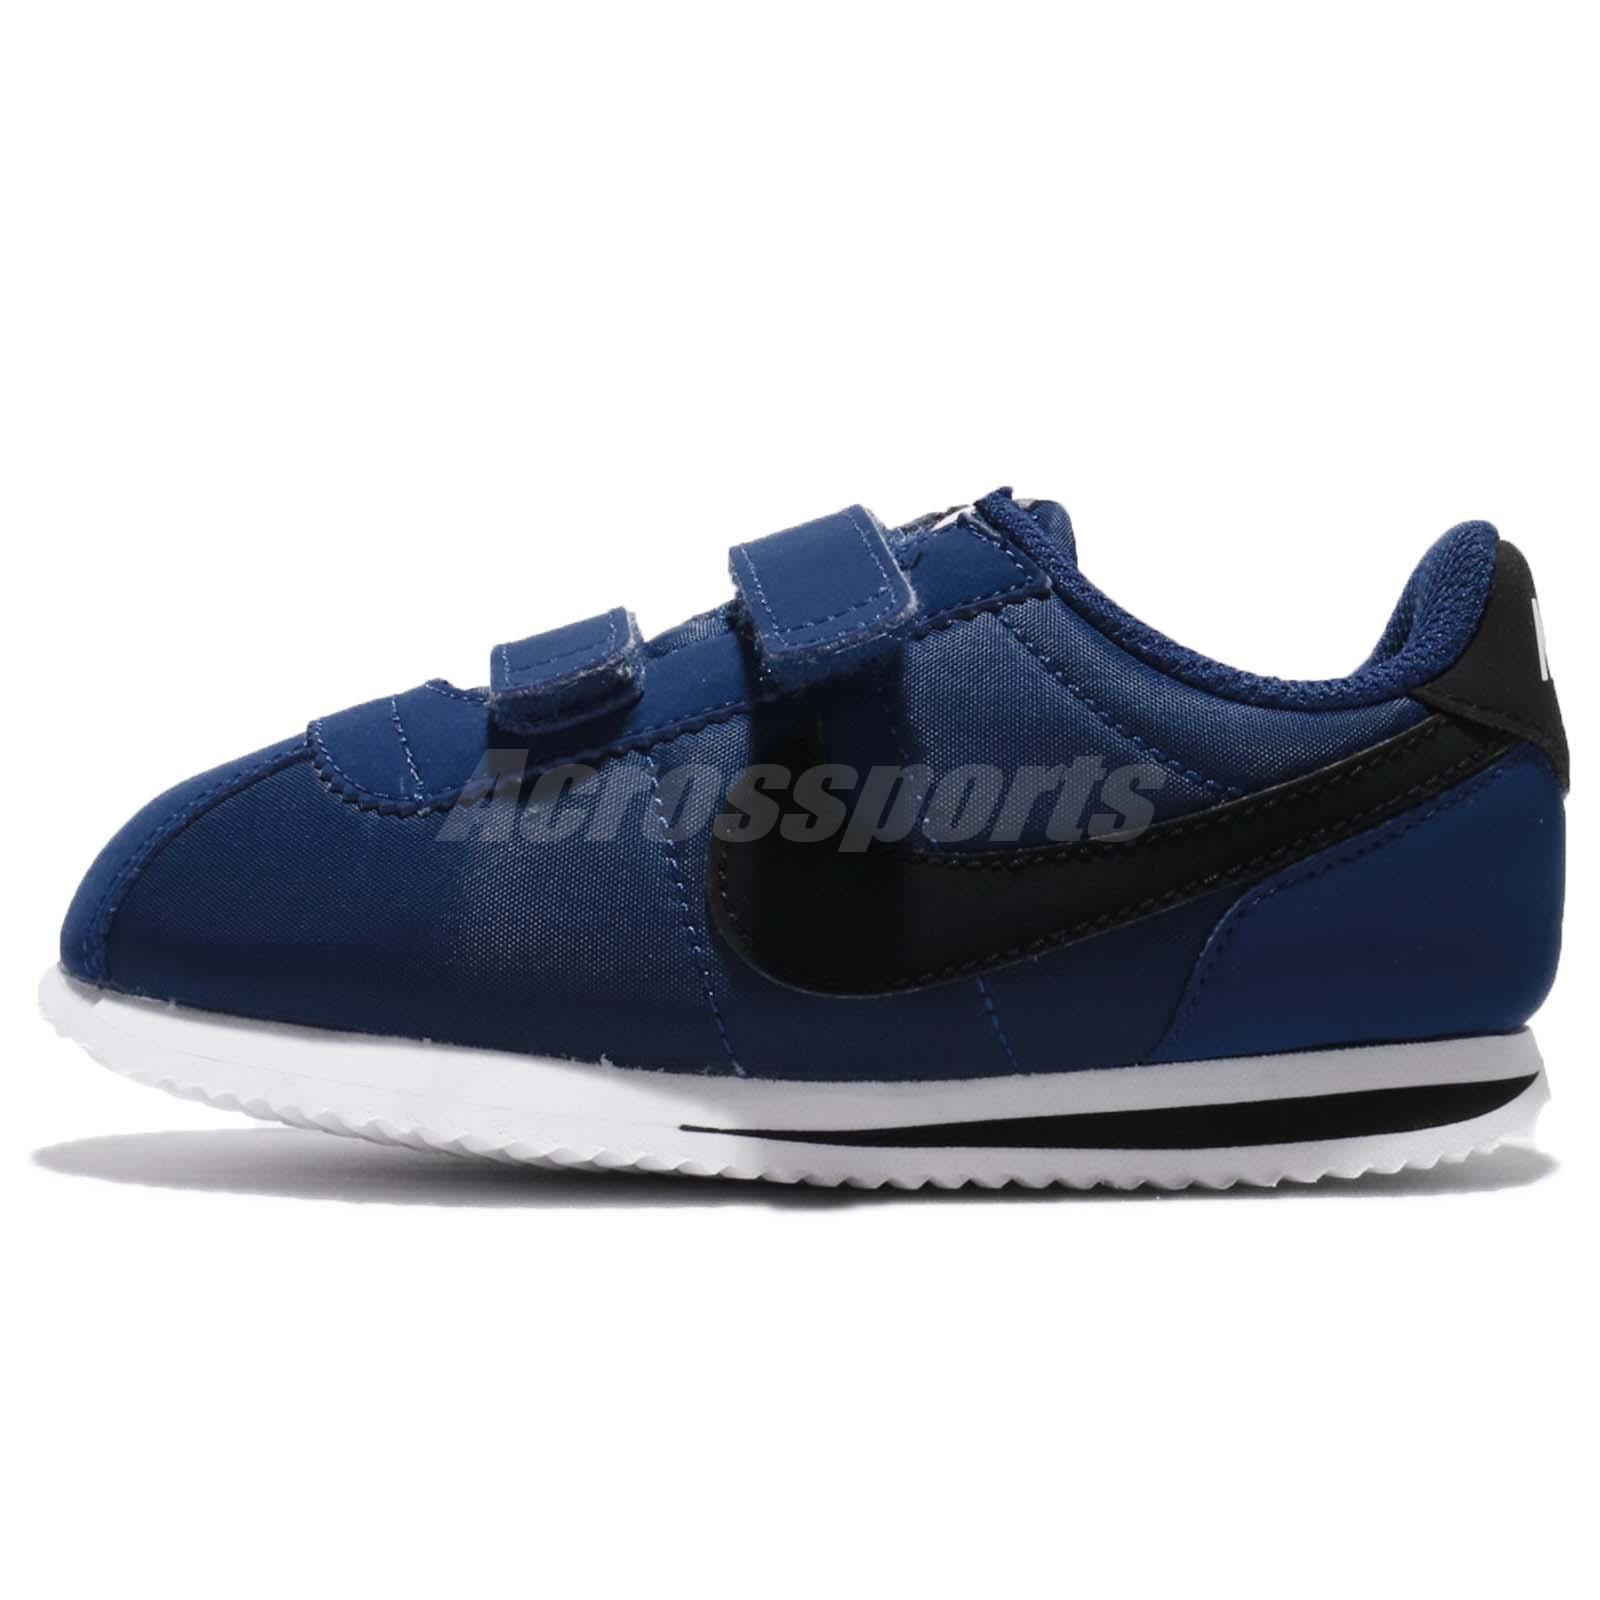 Nike Cortez Basic Nylon TDV Gym Blue Black Toddler Infant Baby Shoes